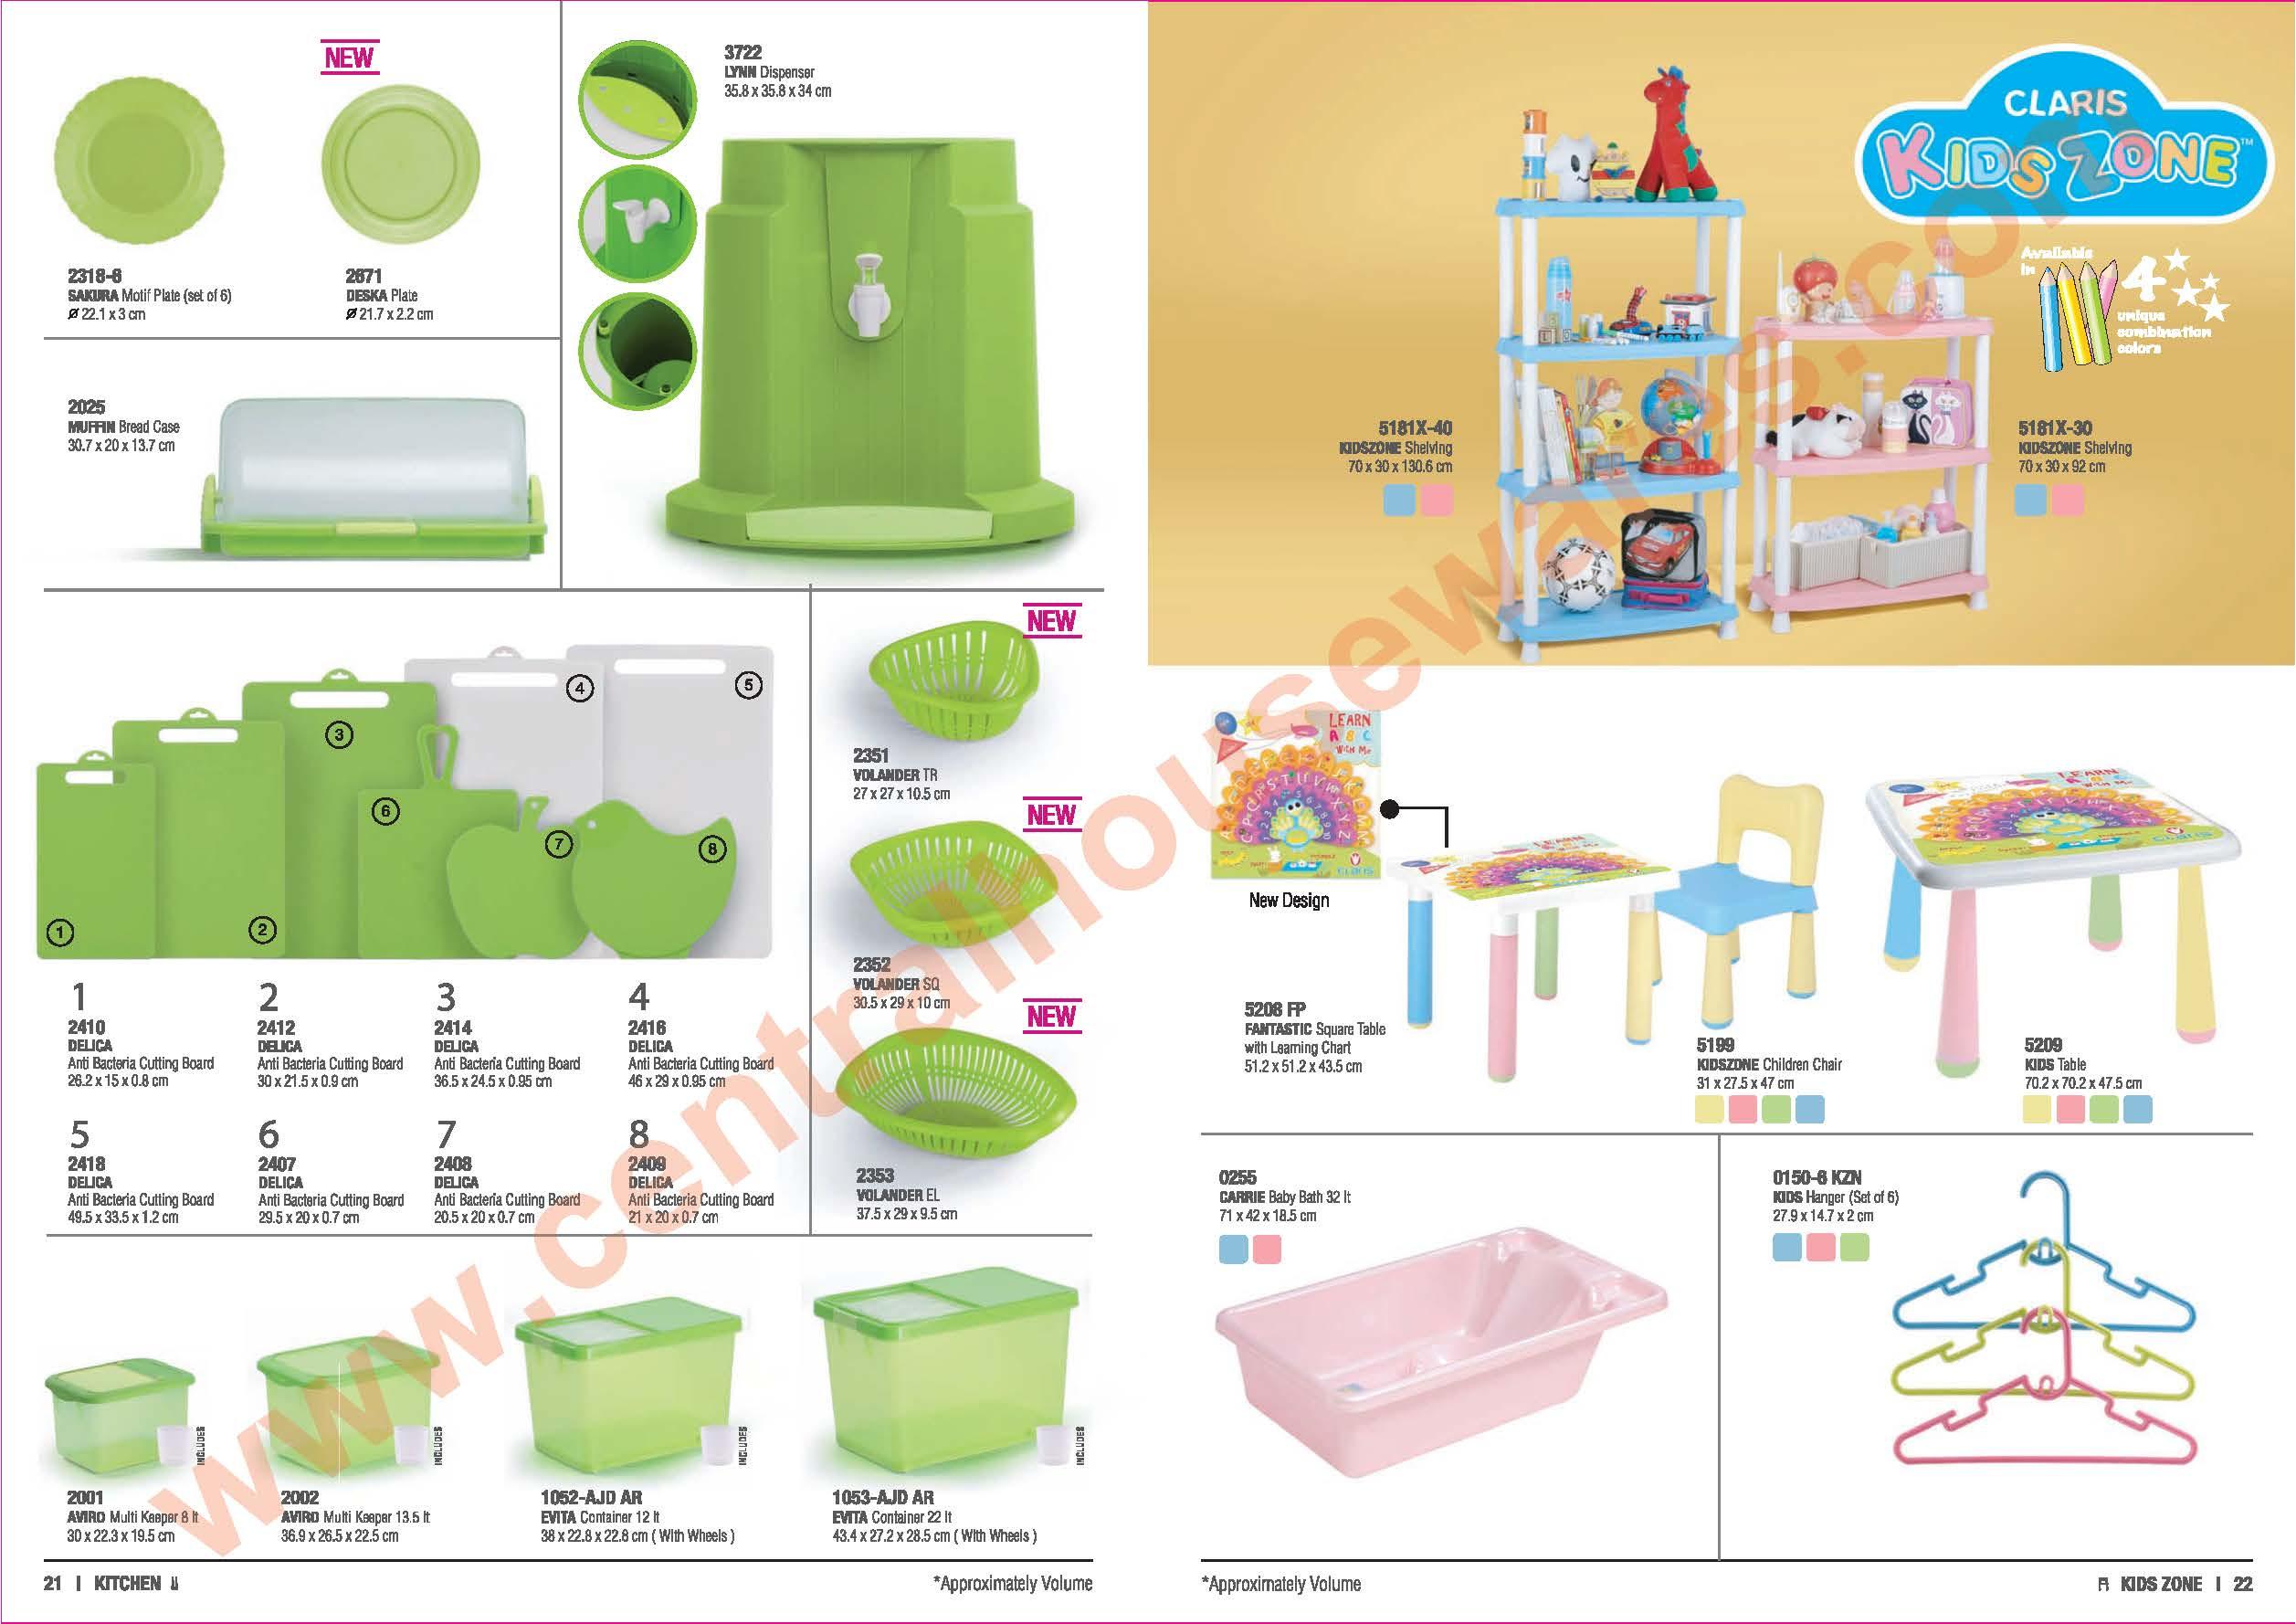 Claris Plastic Keranjang Nampan Kecil 0560